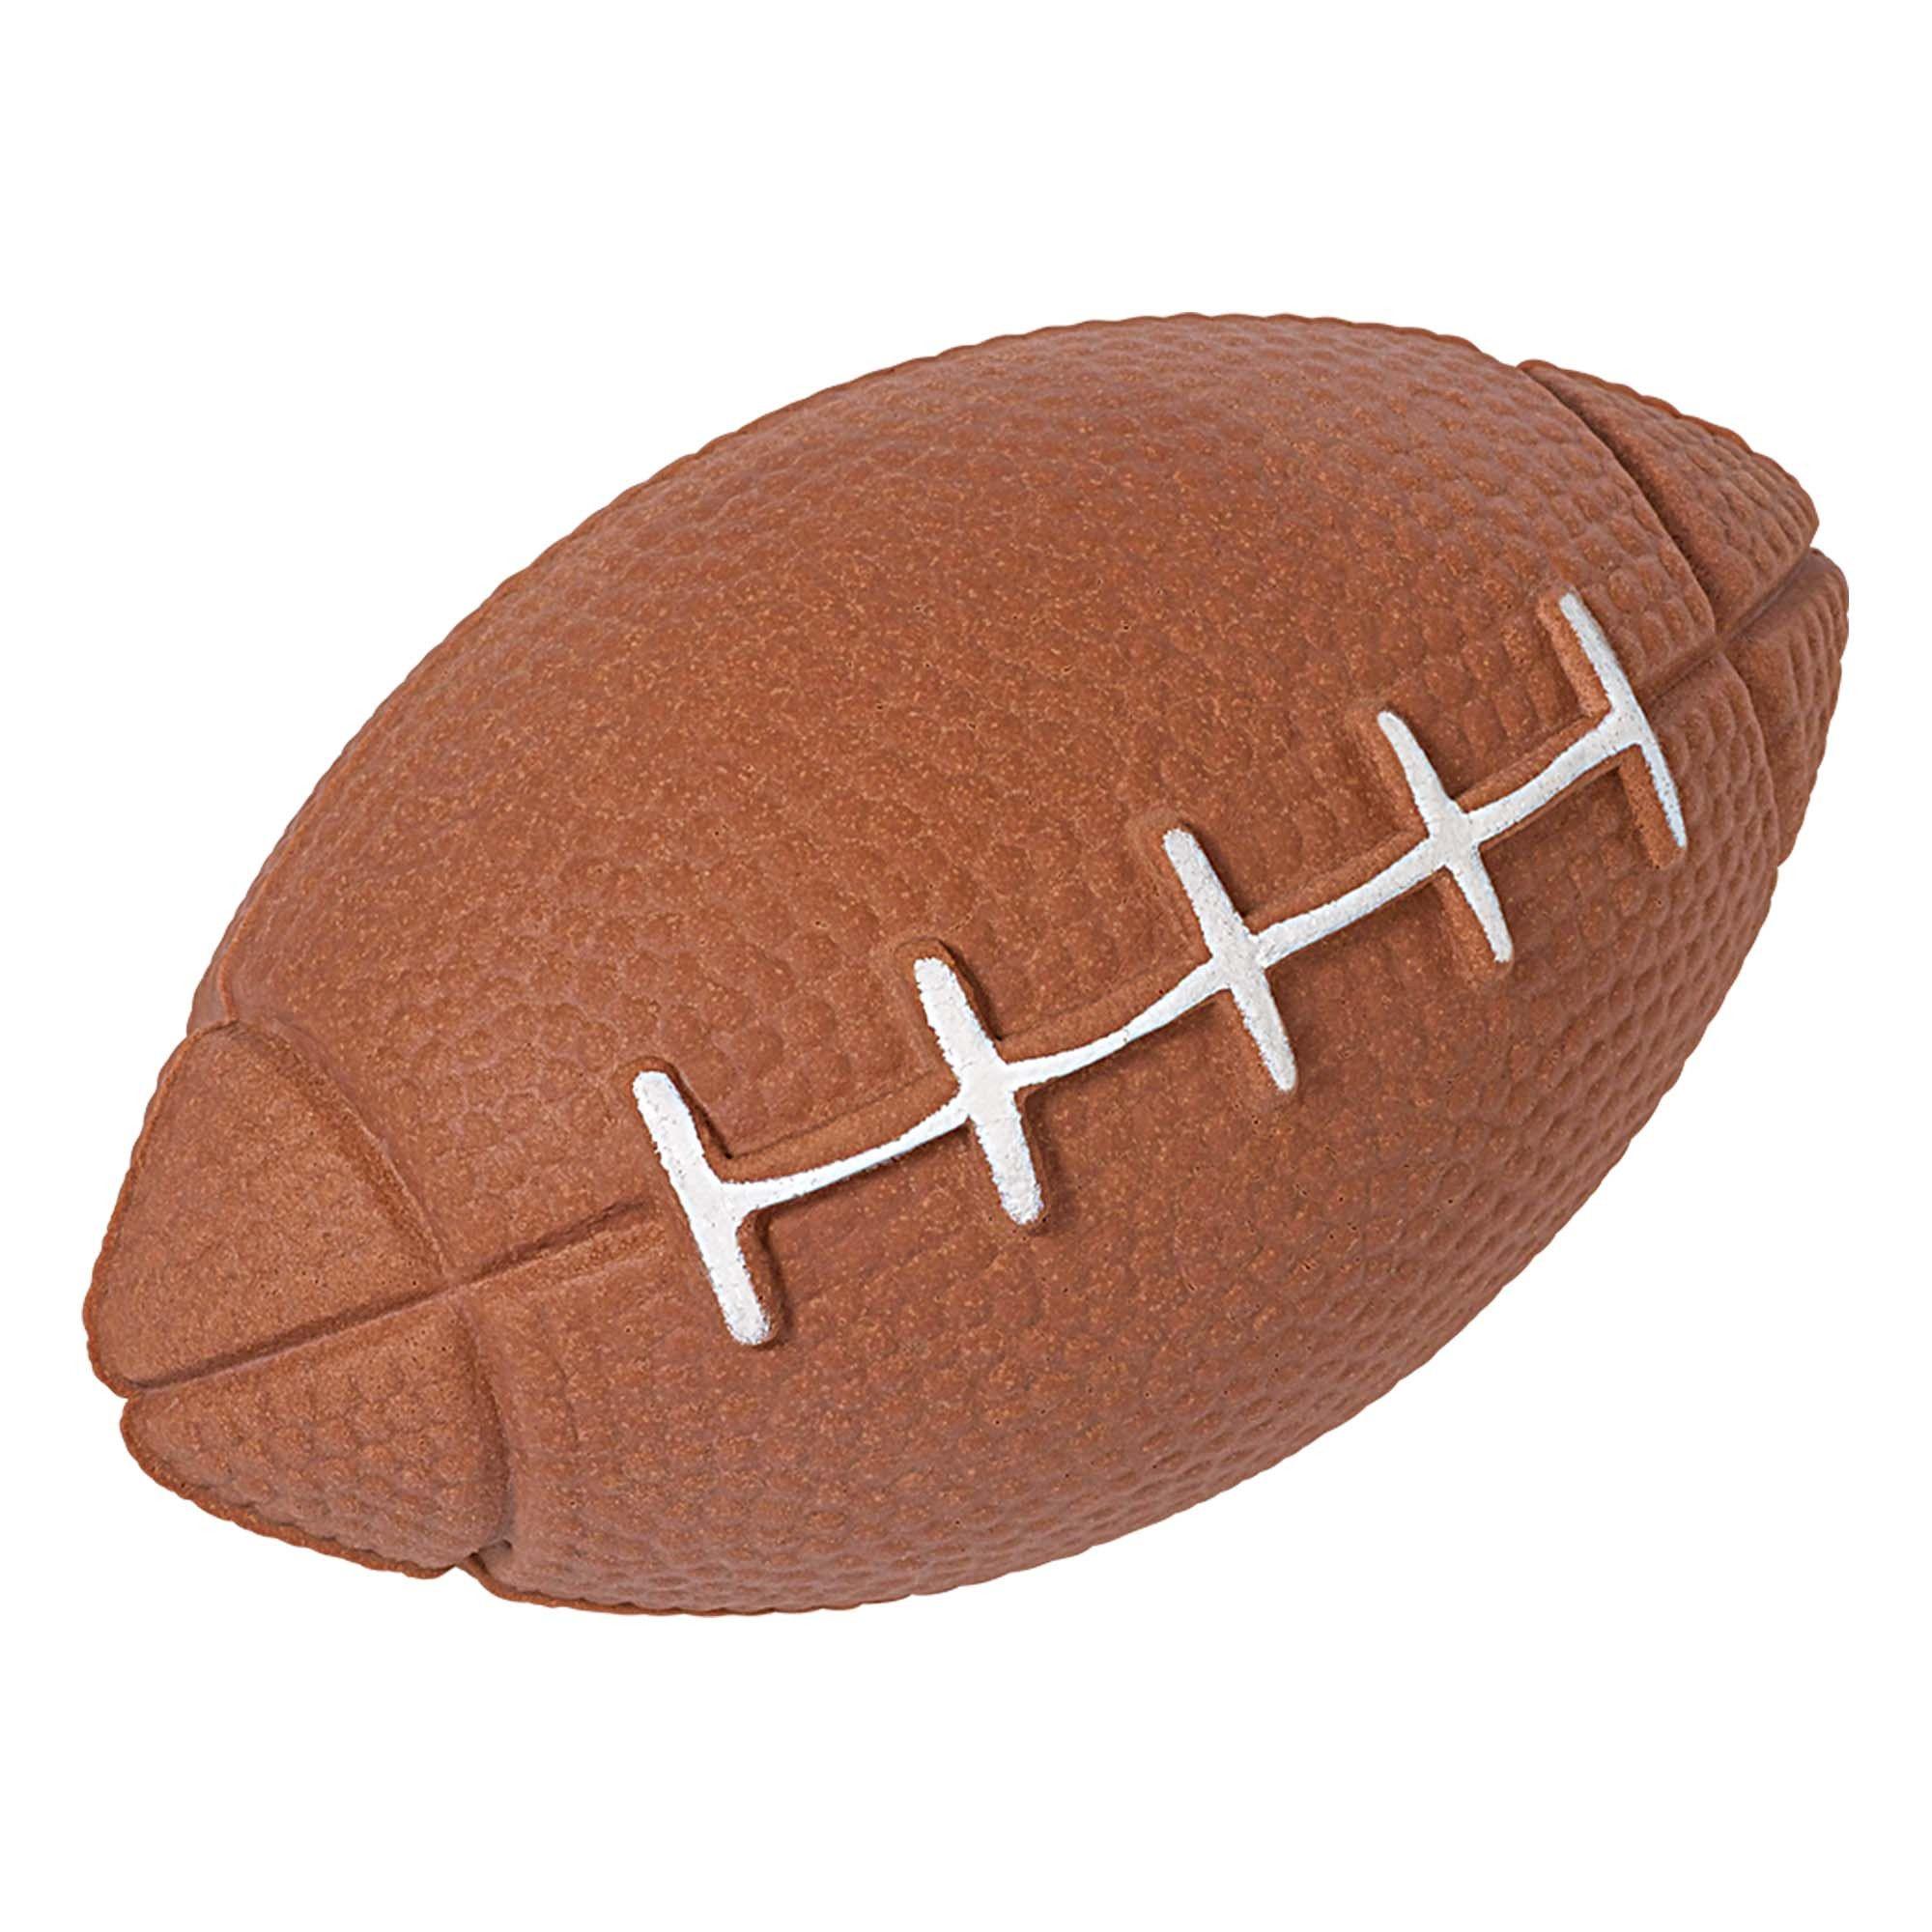 Sponge Footballs